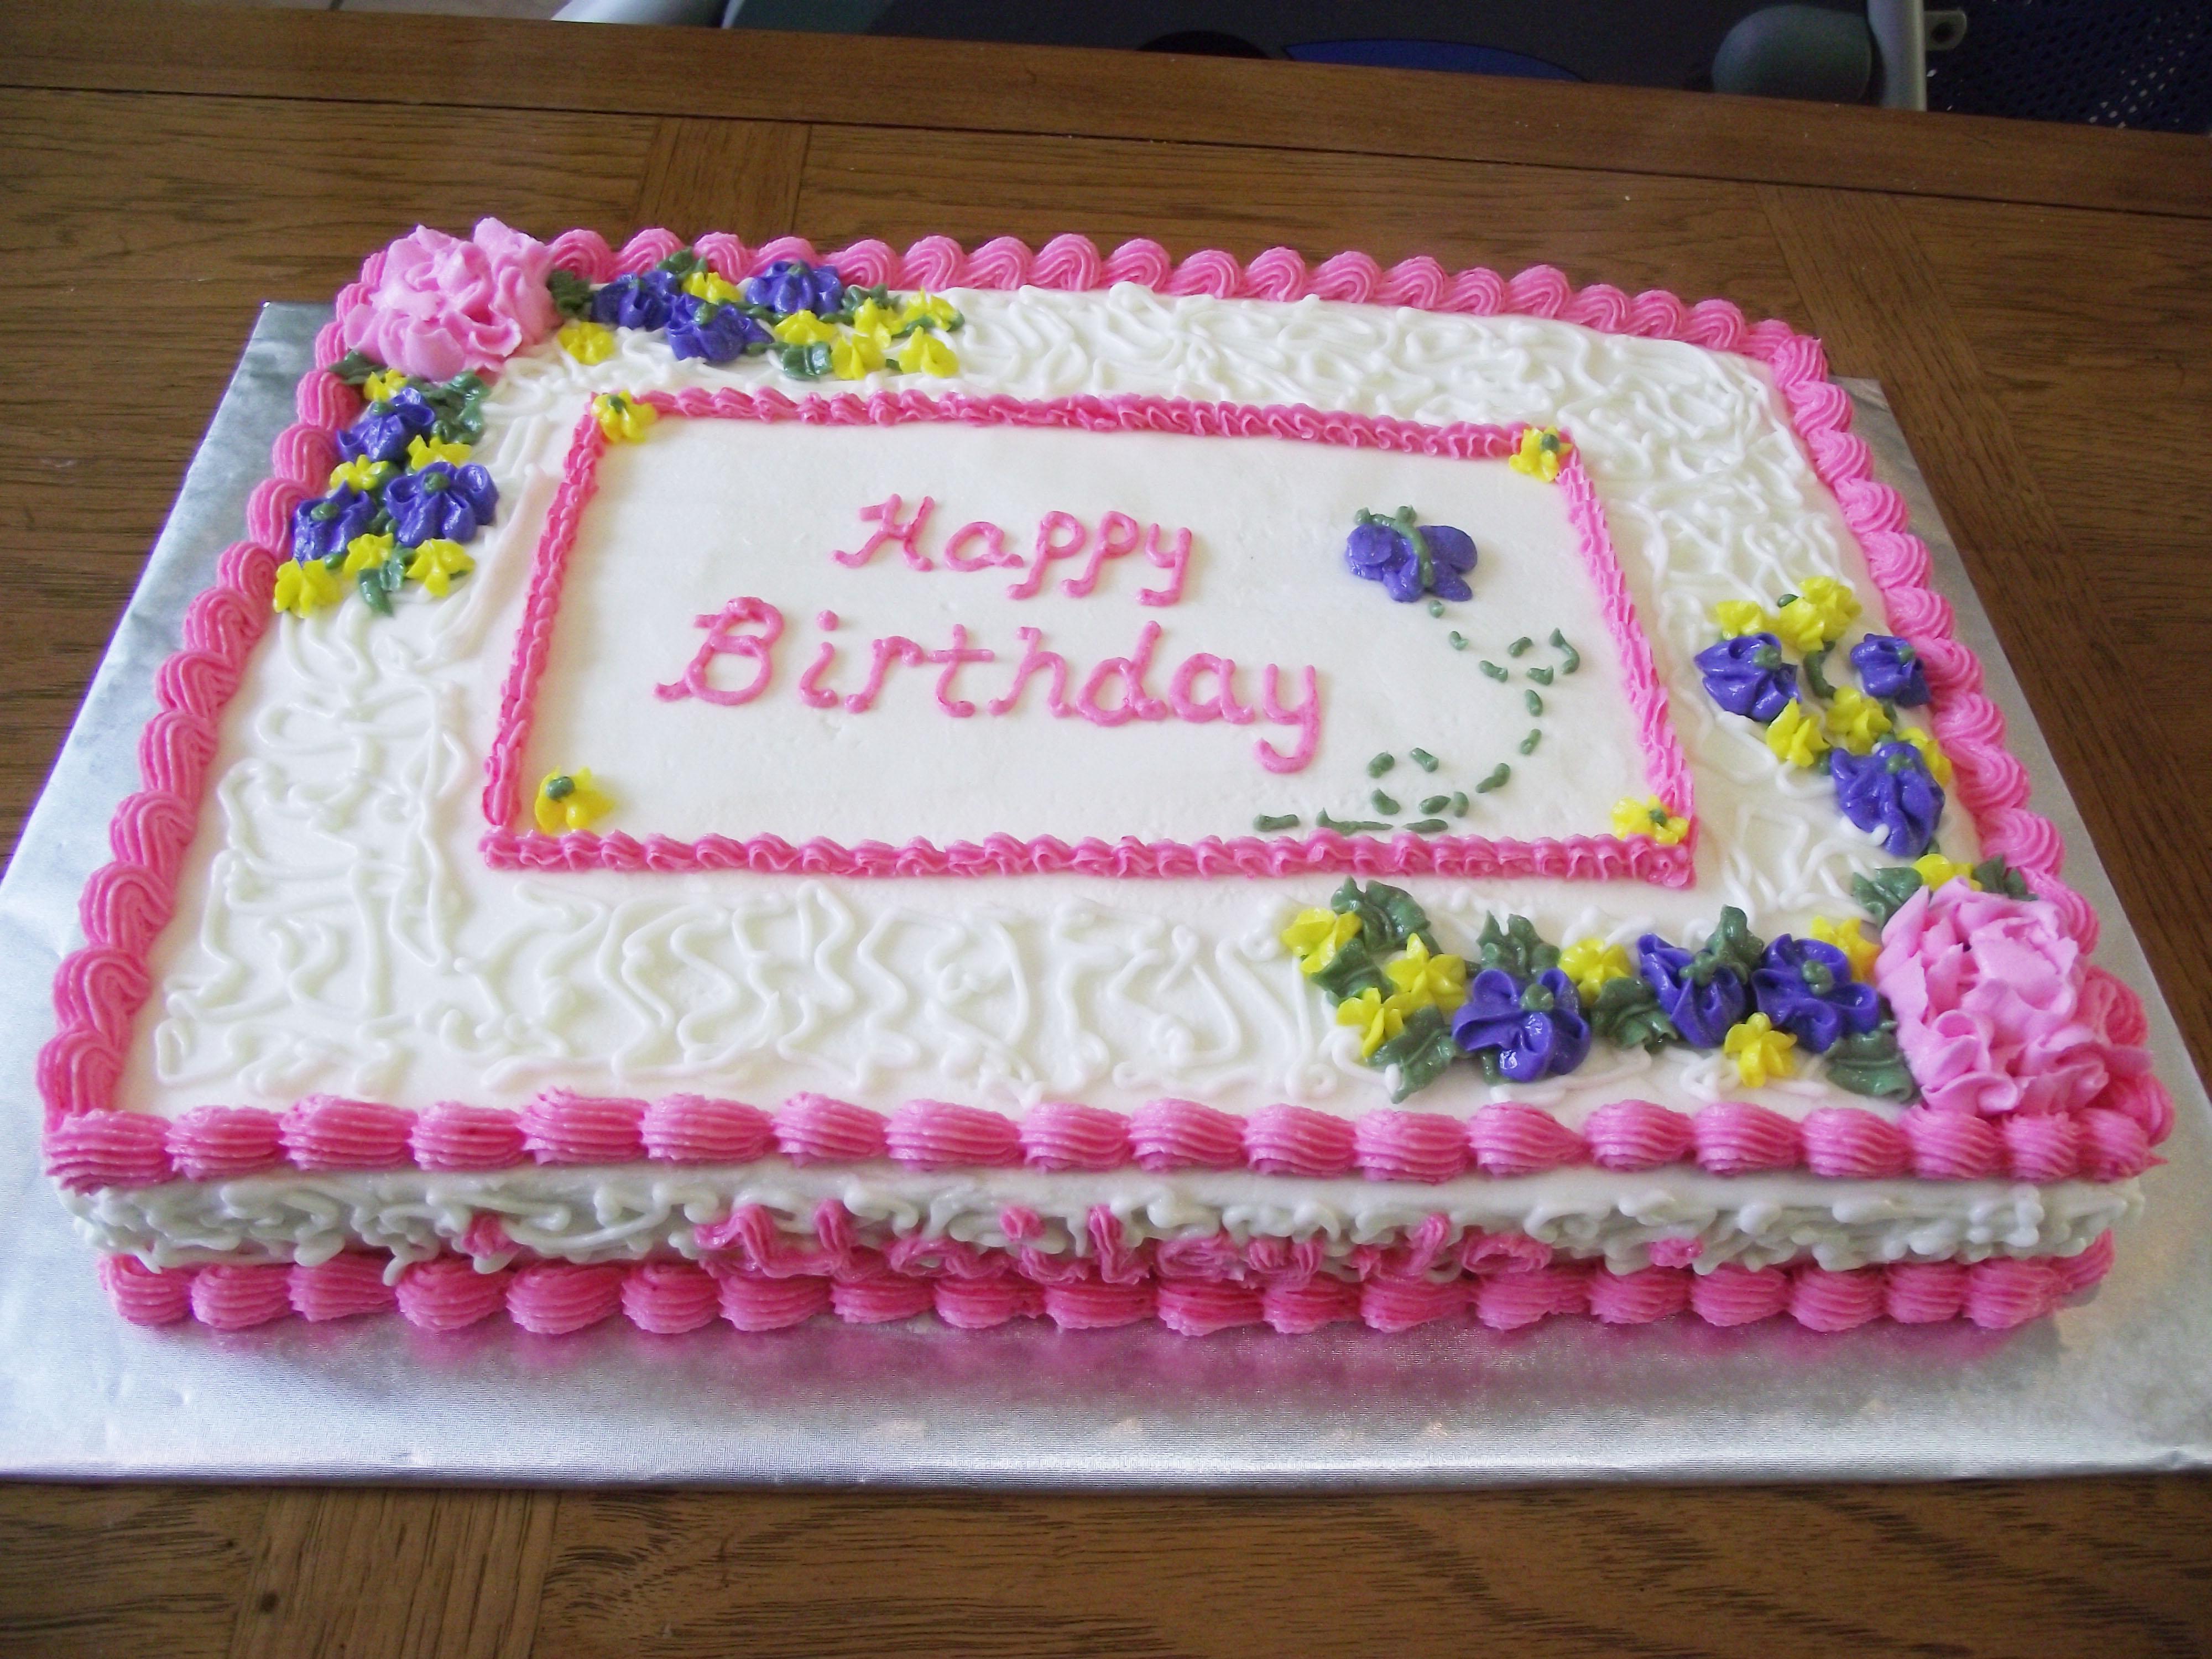 For Birthday Cakes